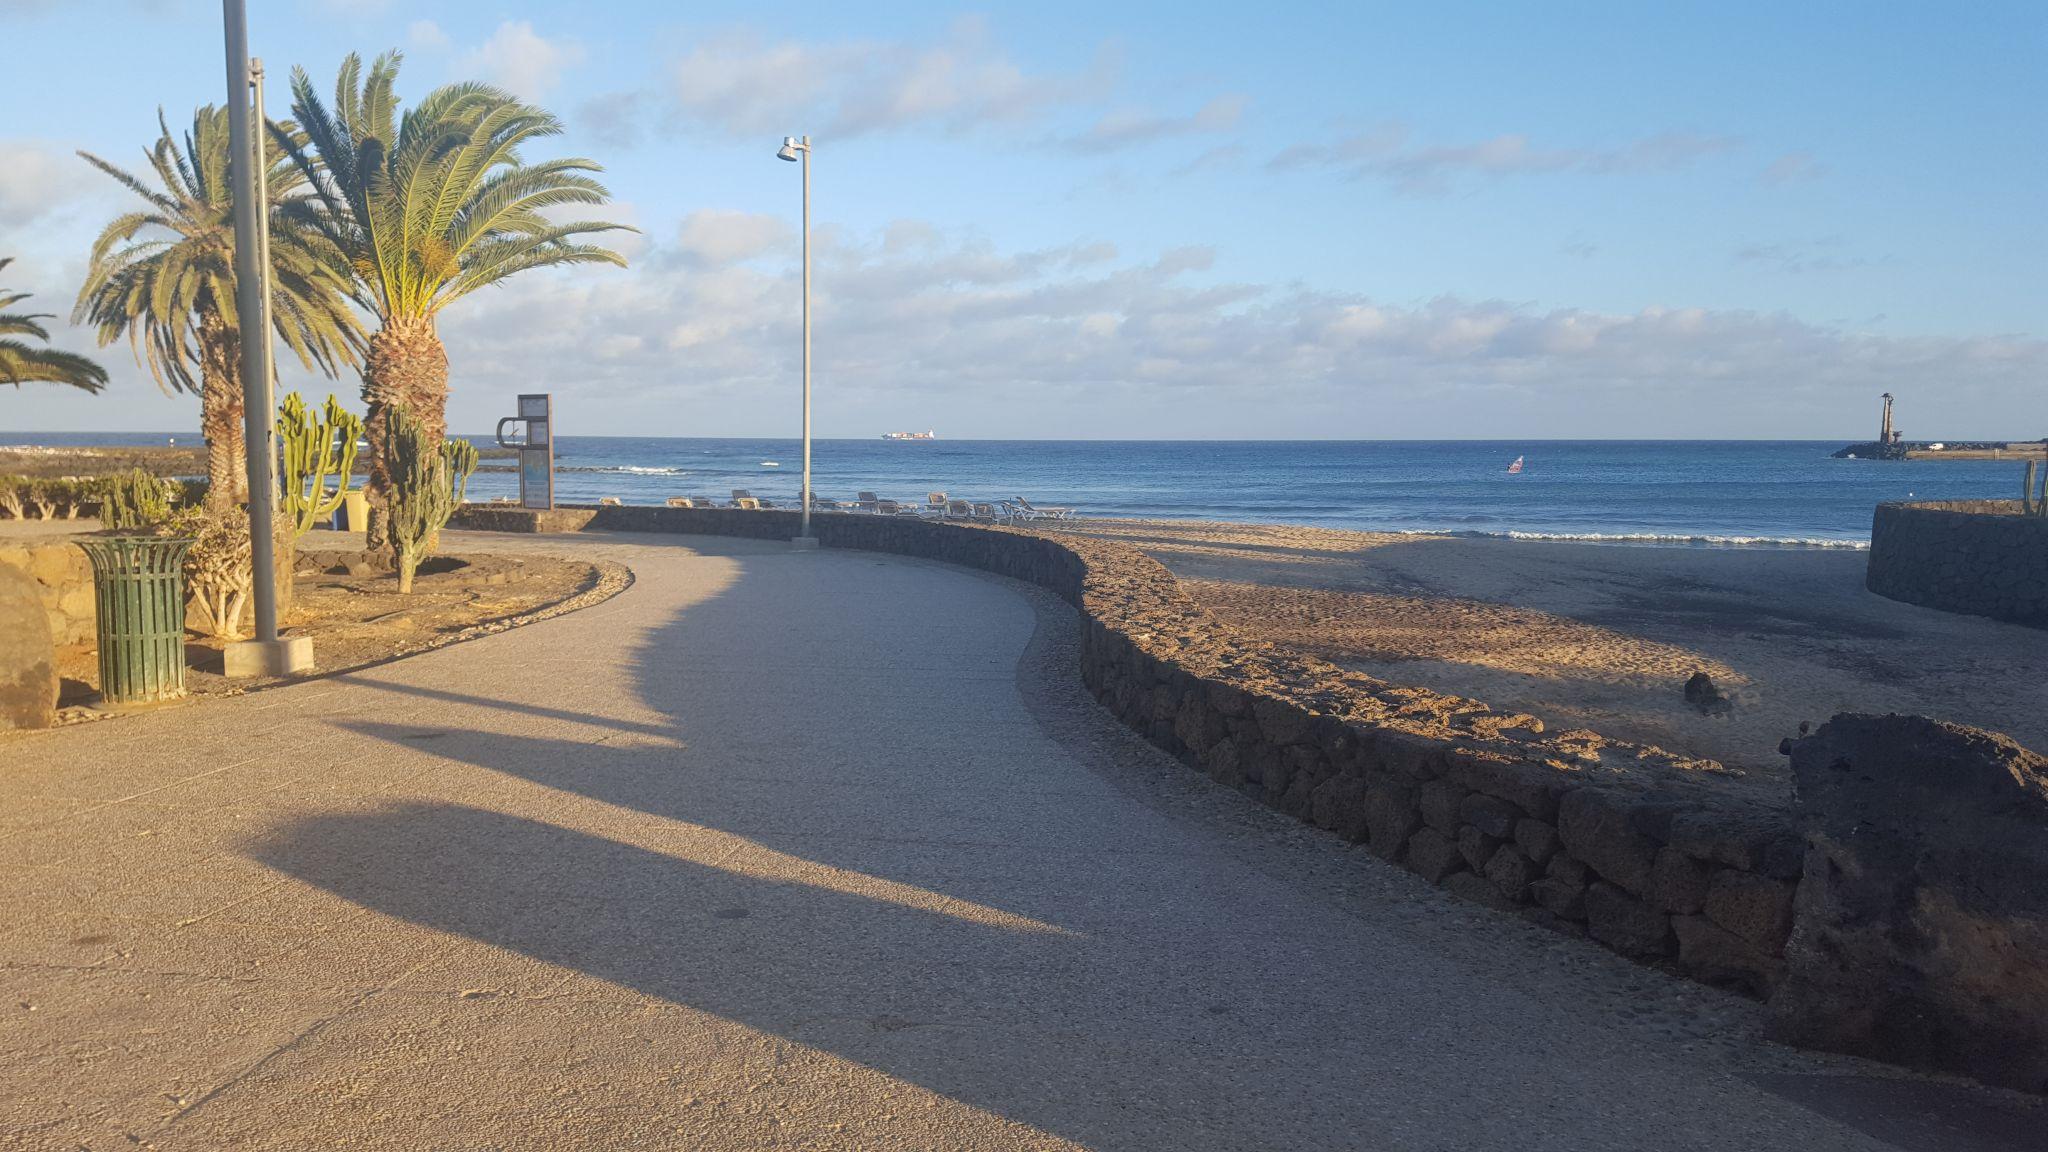 20160925 201054 1440x810 - My Travel Diaries: Lanzarote